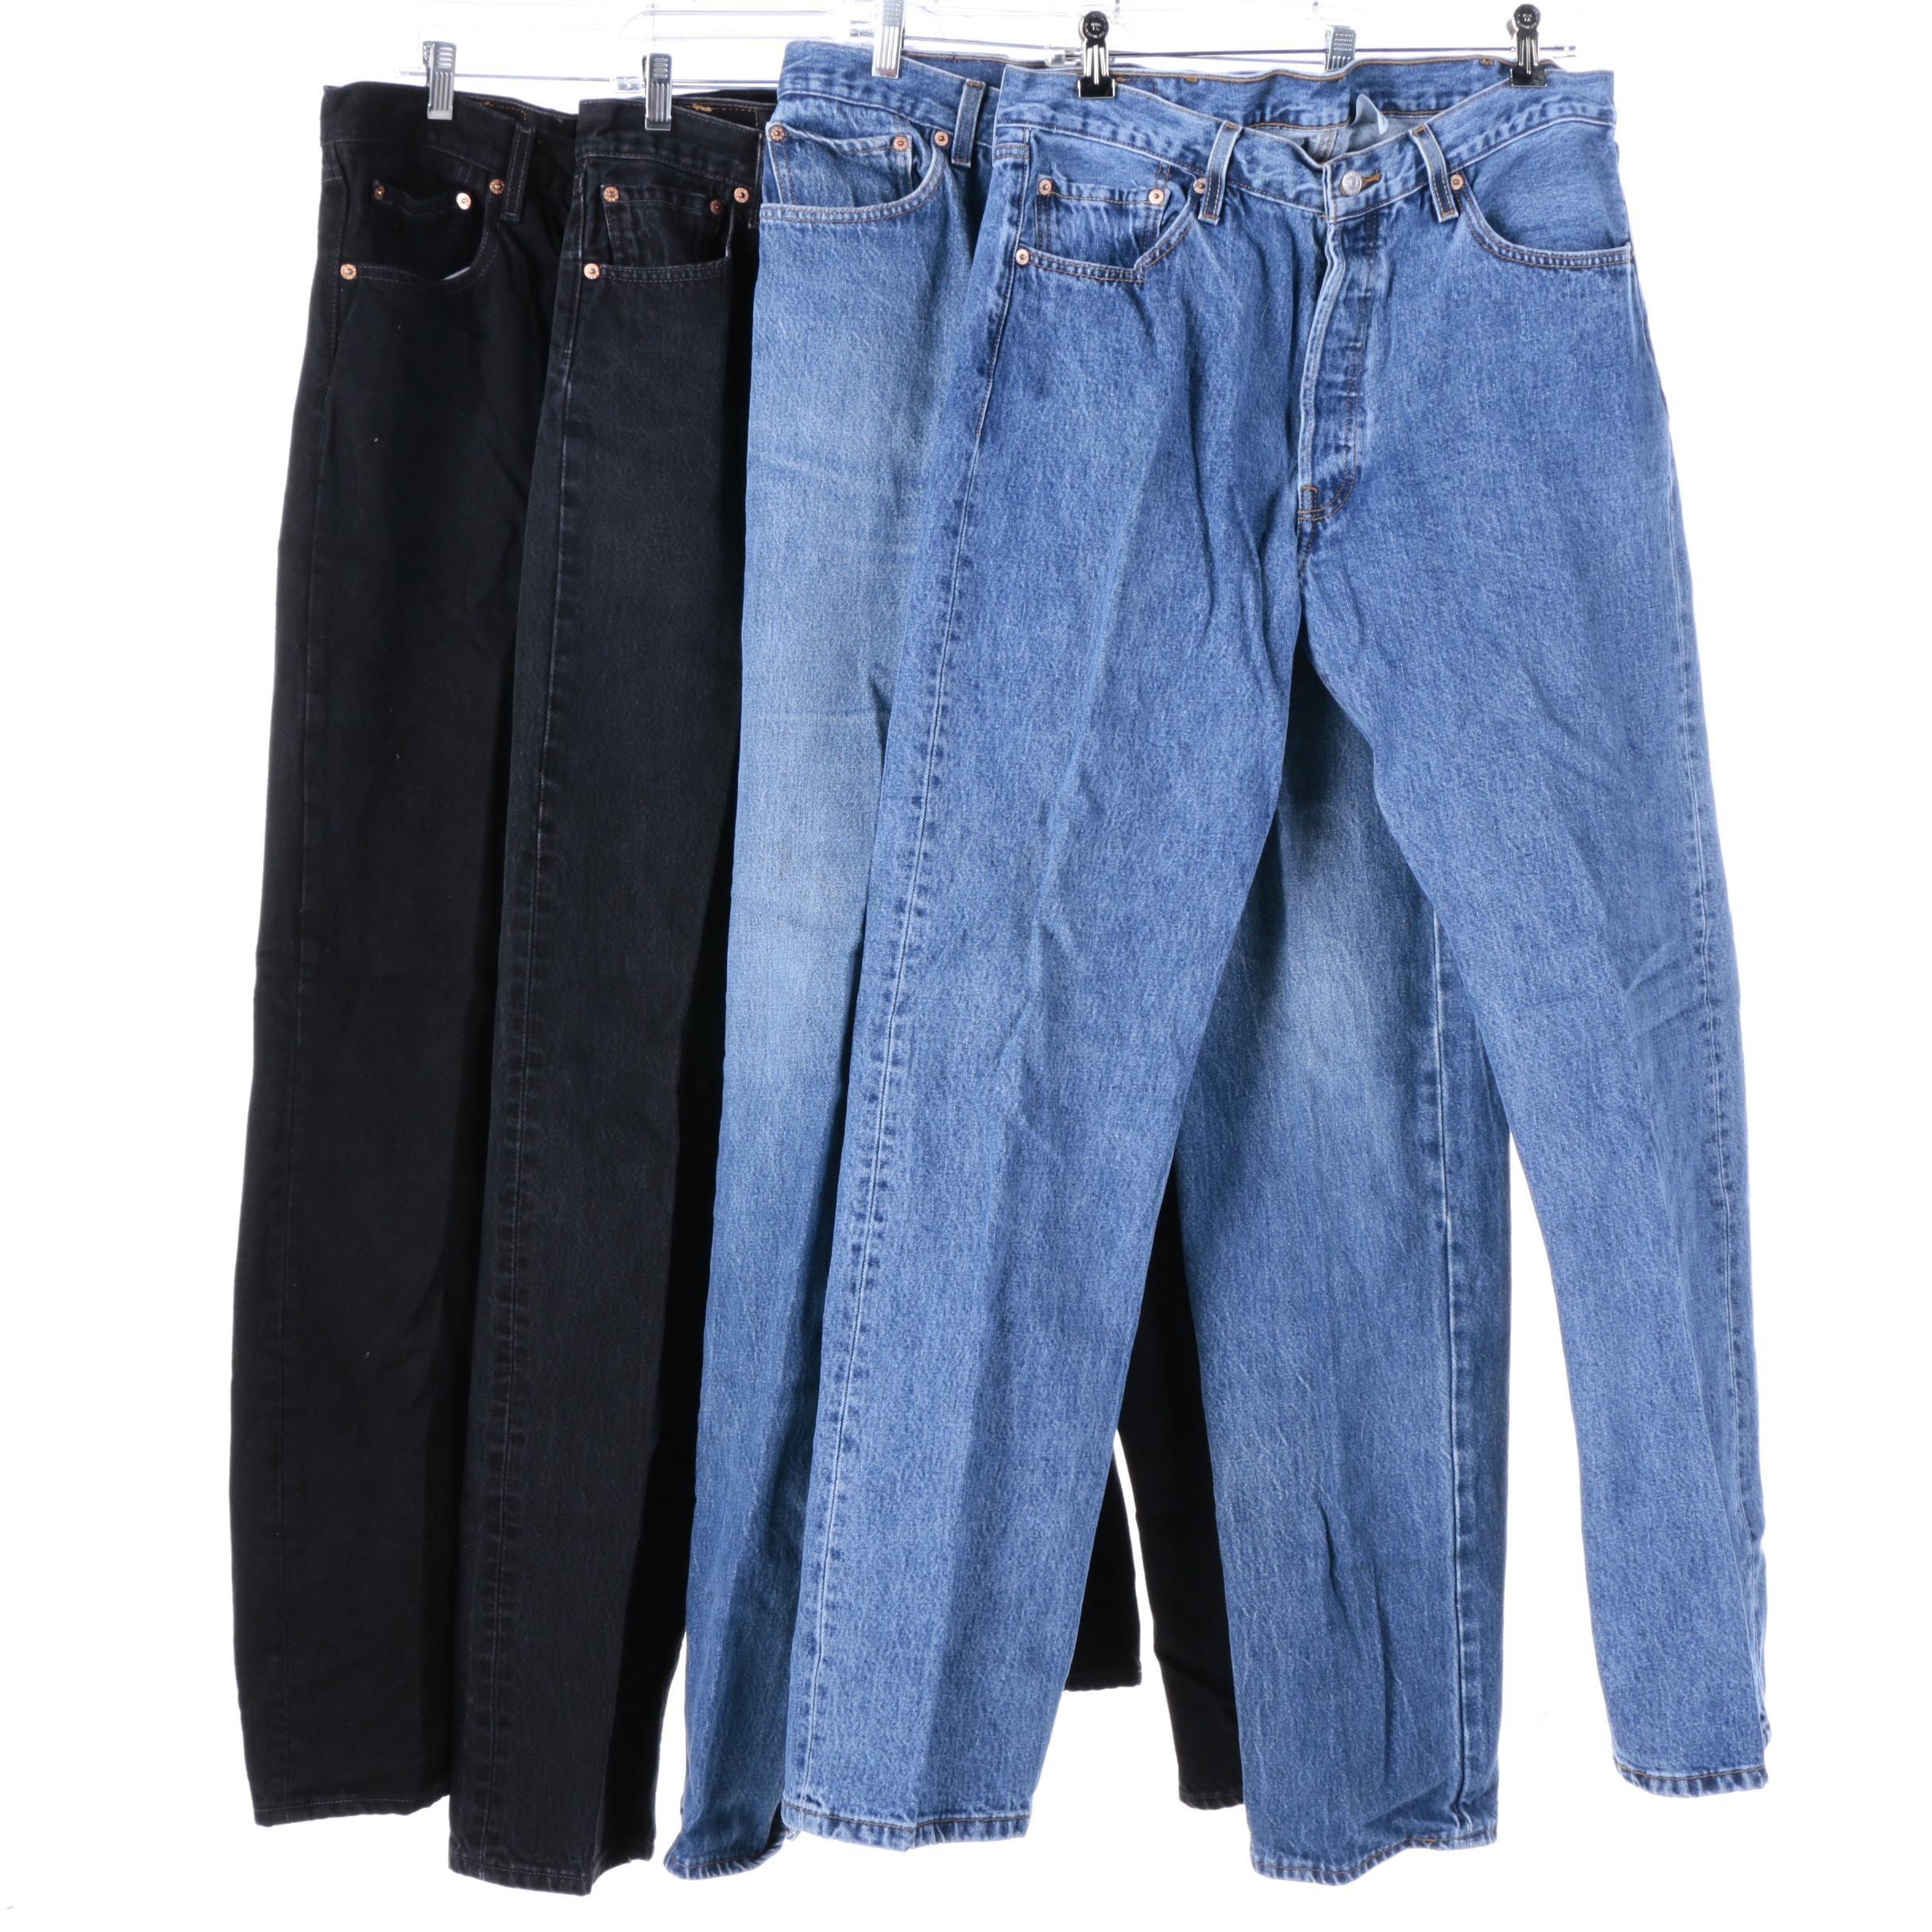 Levi Strauss & Co. Men's Jeans